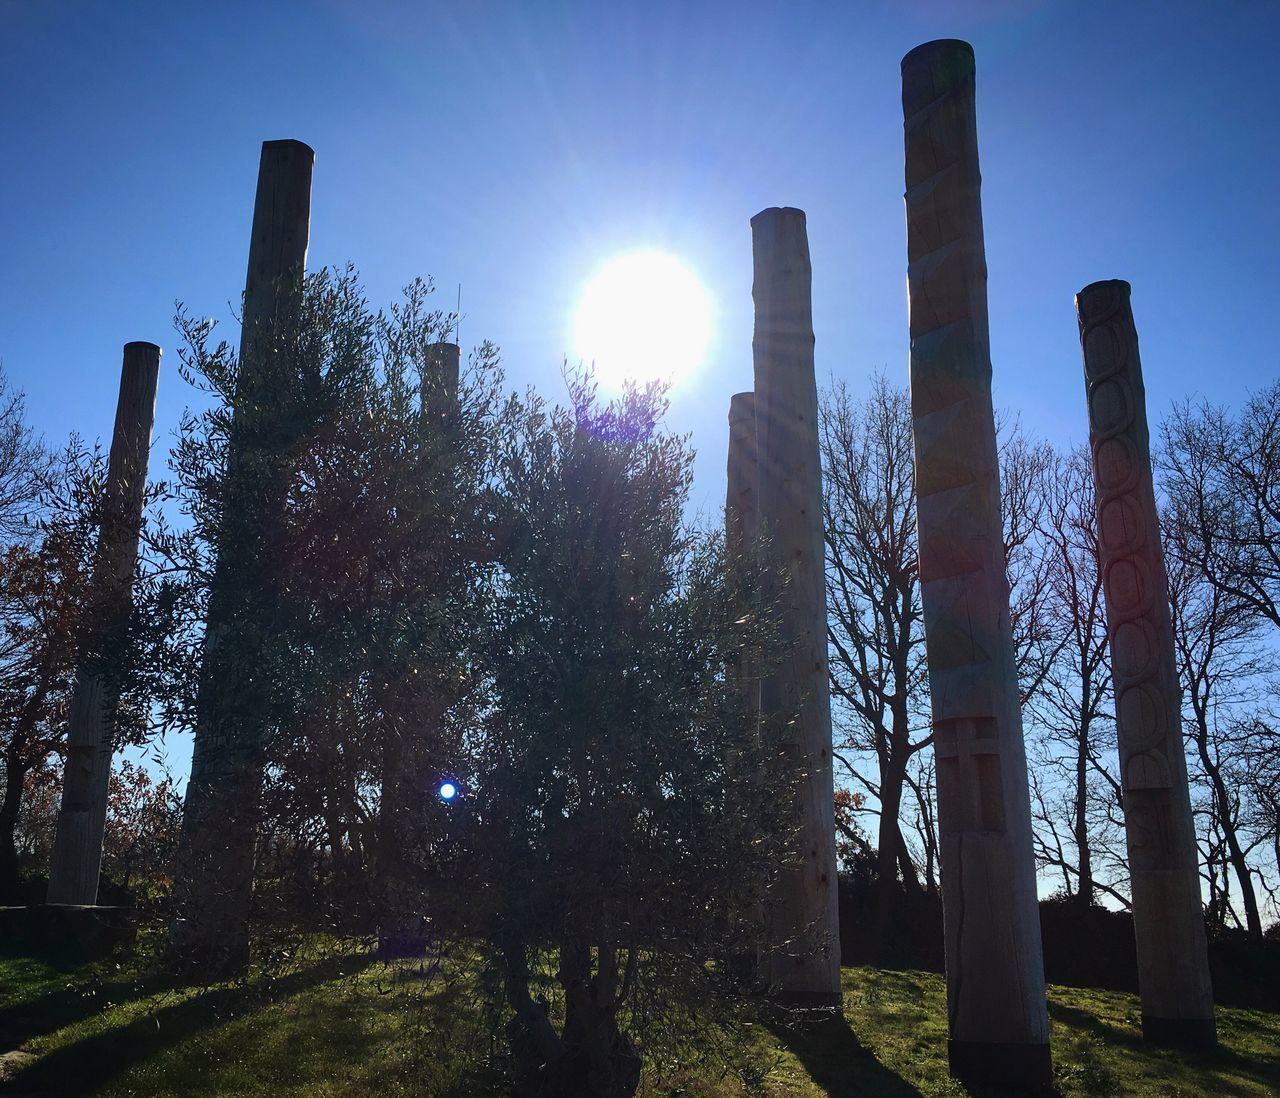 Praying Spiritual Nature Nature_collection Nature Photography Naturelovers Sun Sky Silhouette Art Modern Art Showcase April